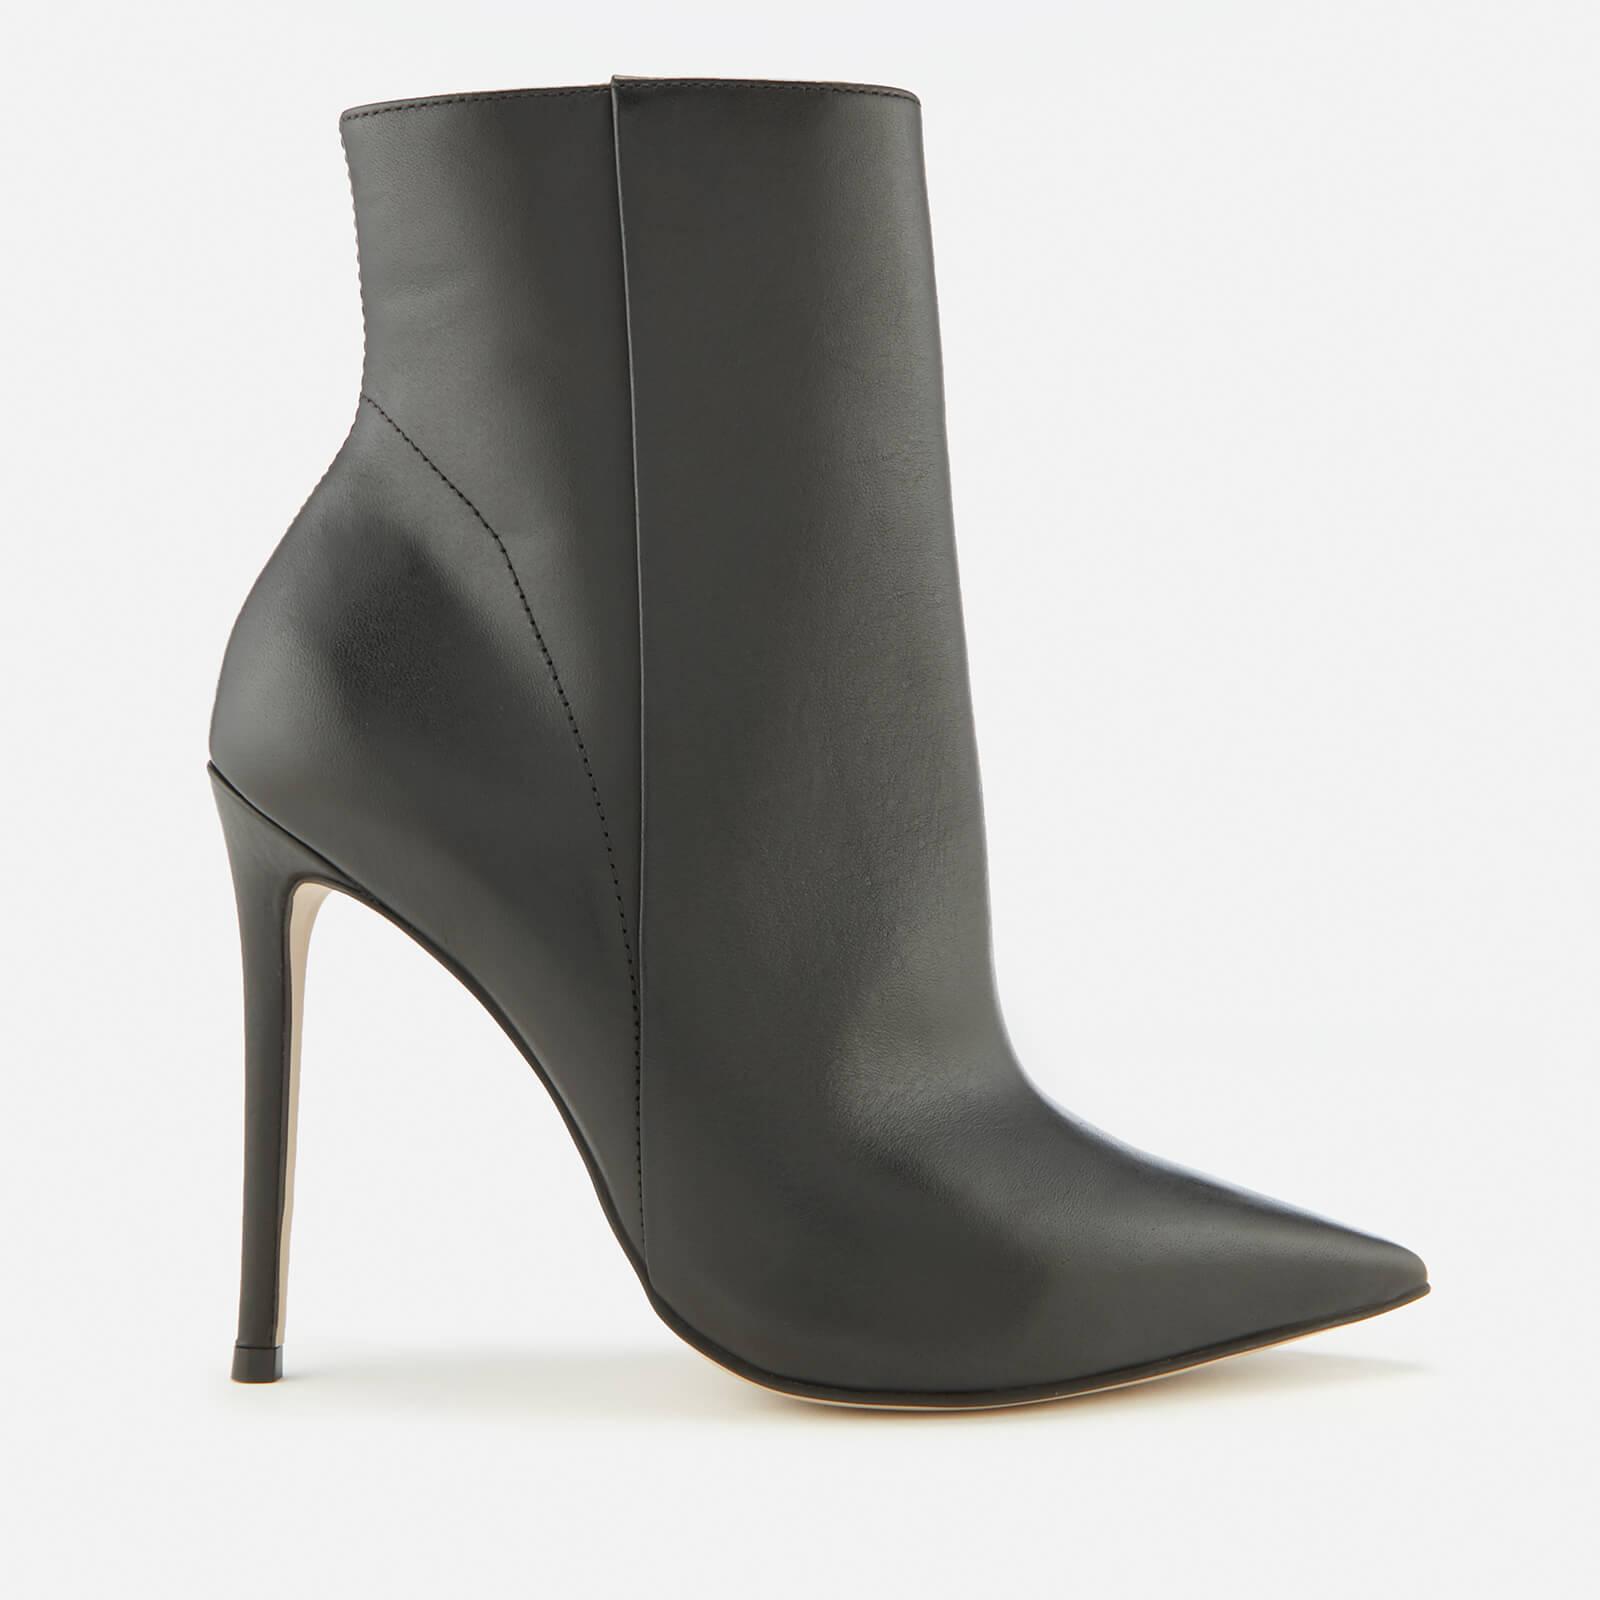 05e376395f5 Carvela Women's Spectacular Leather Heeled Shoe Boots - Black